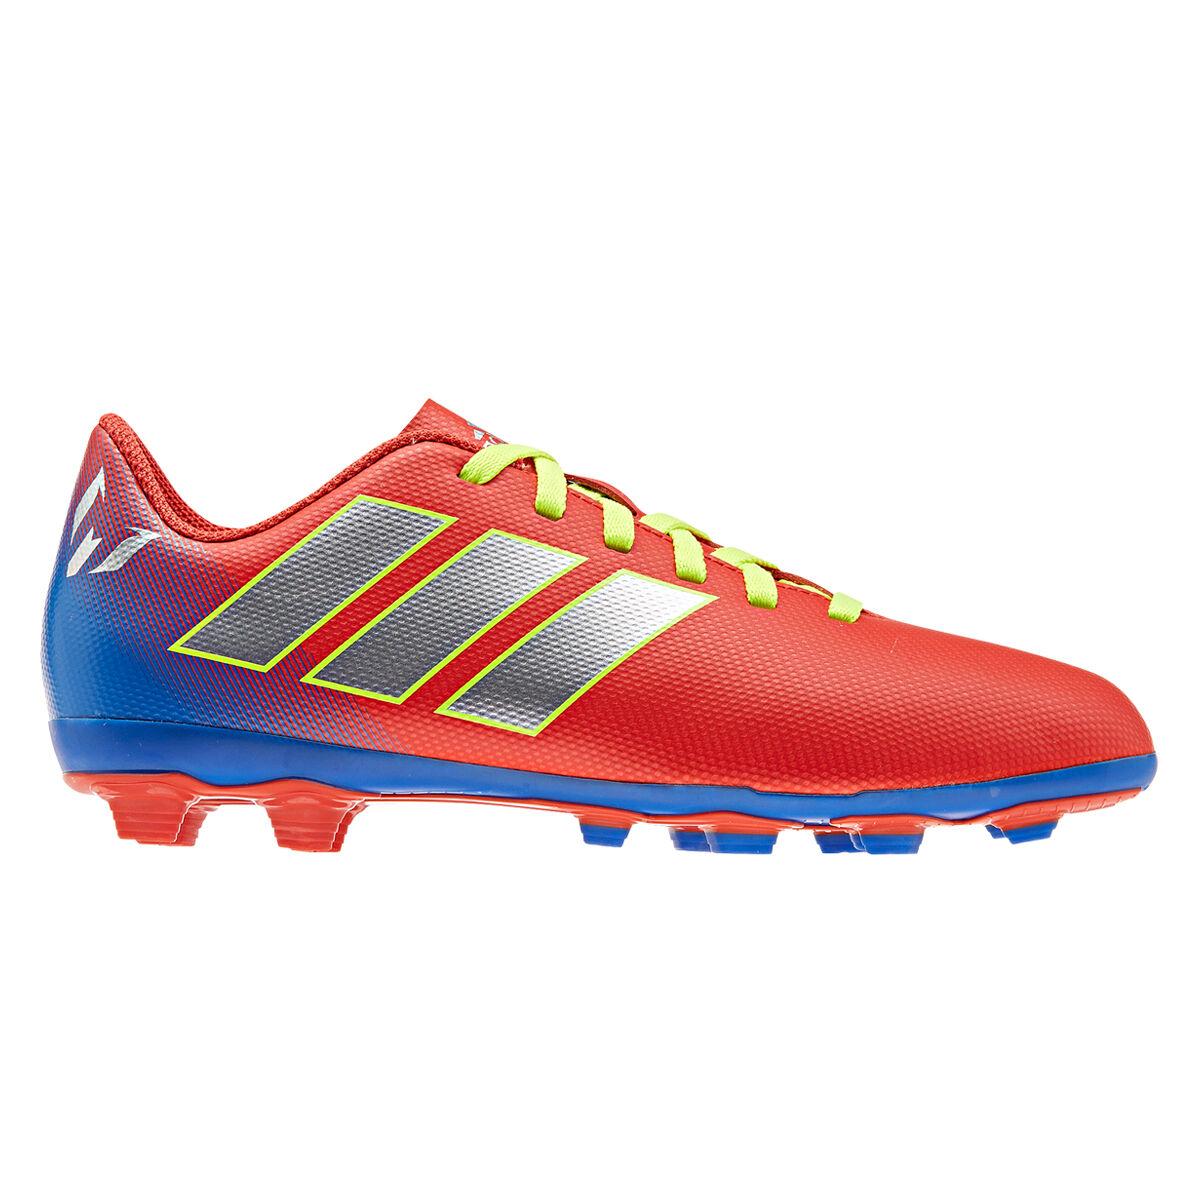 Silver Red Football Kids Us Nemeziz 11 Adidas Messi Boots 4 18 wgRn8qS